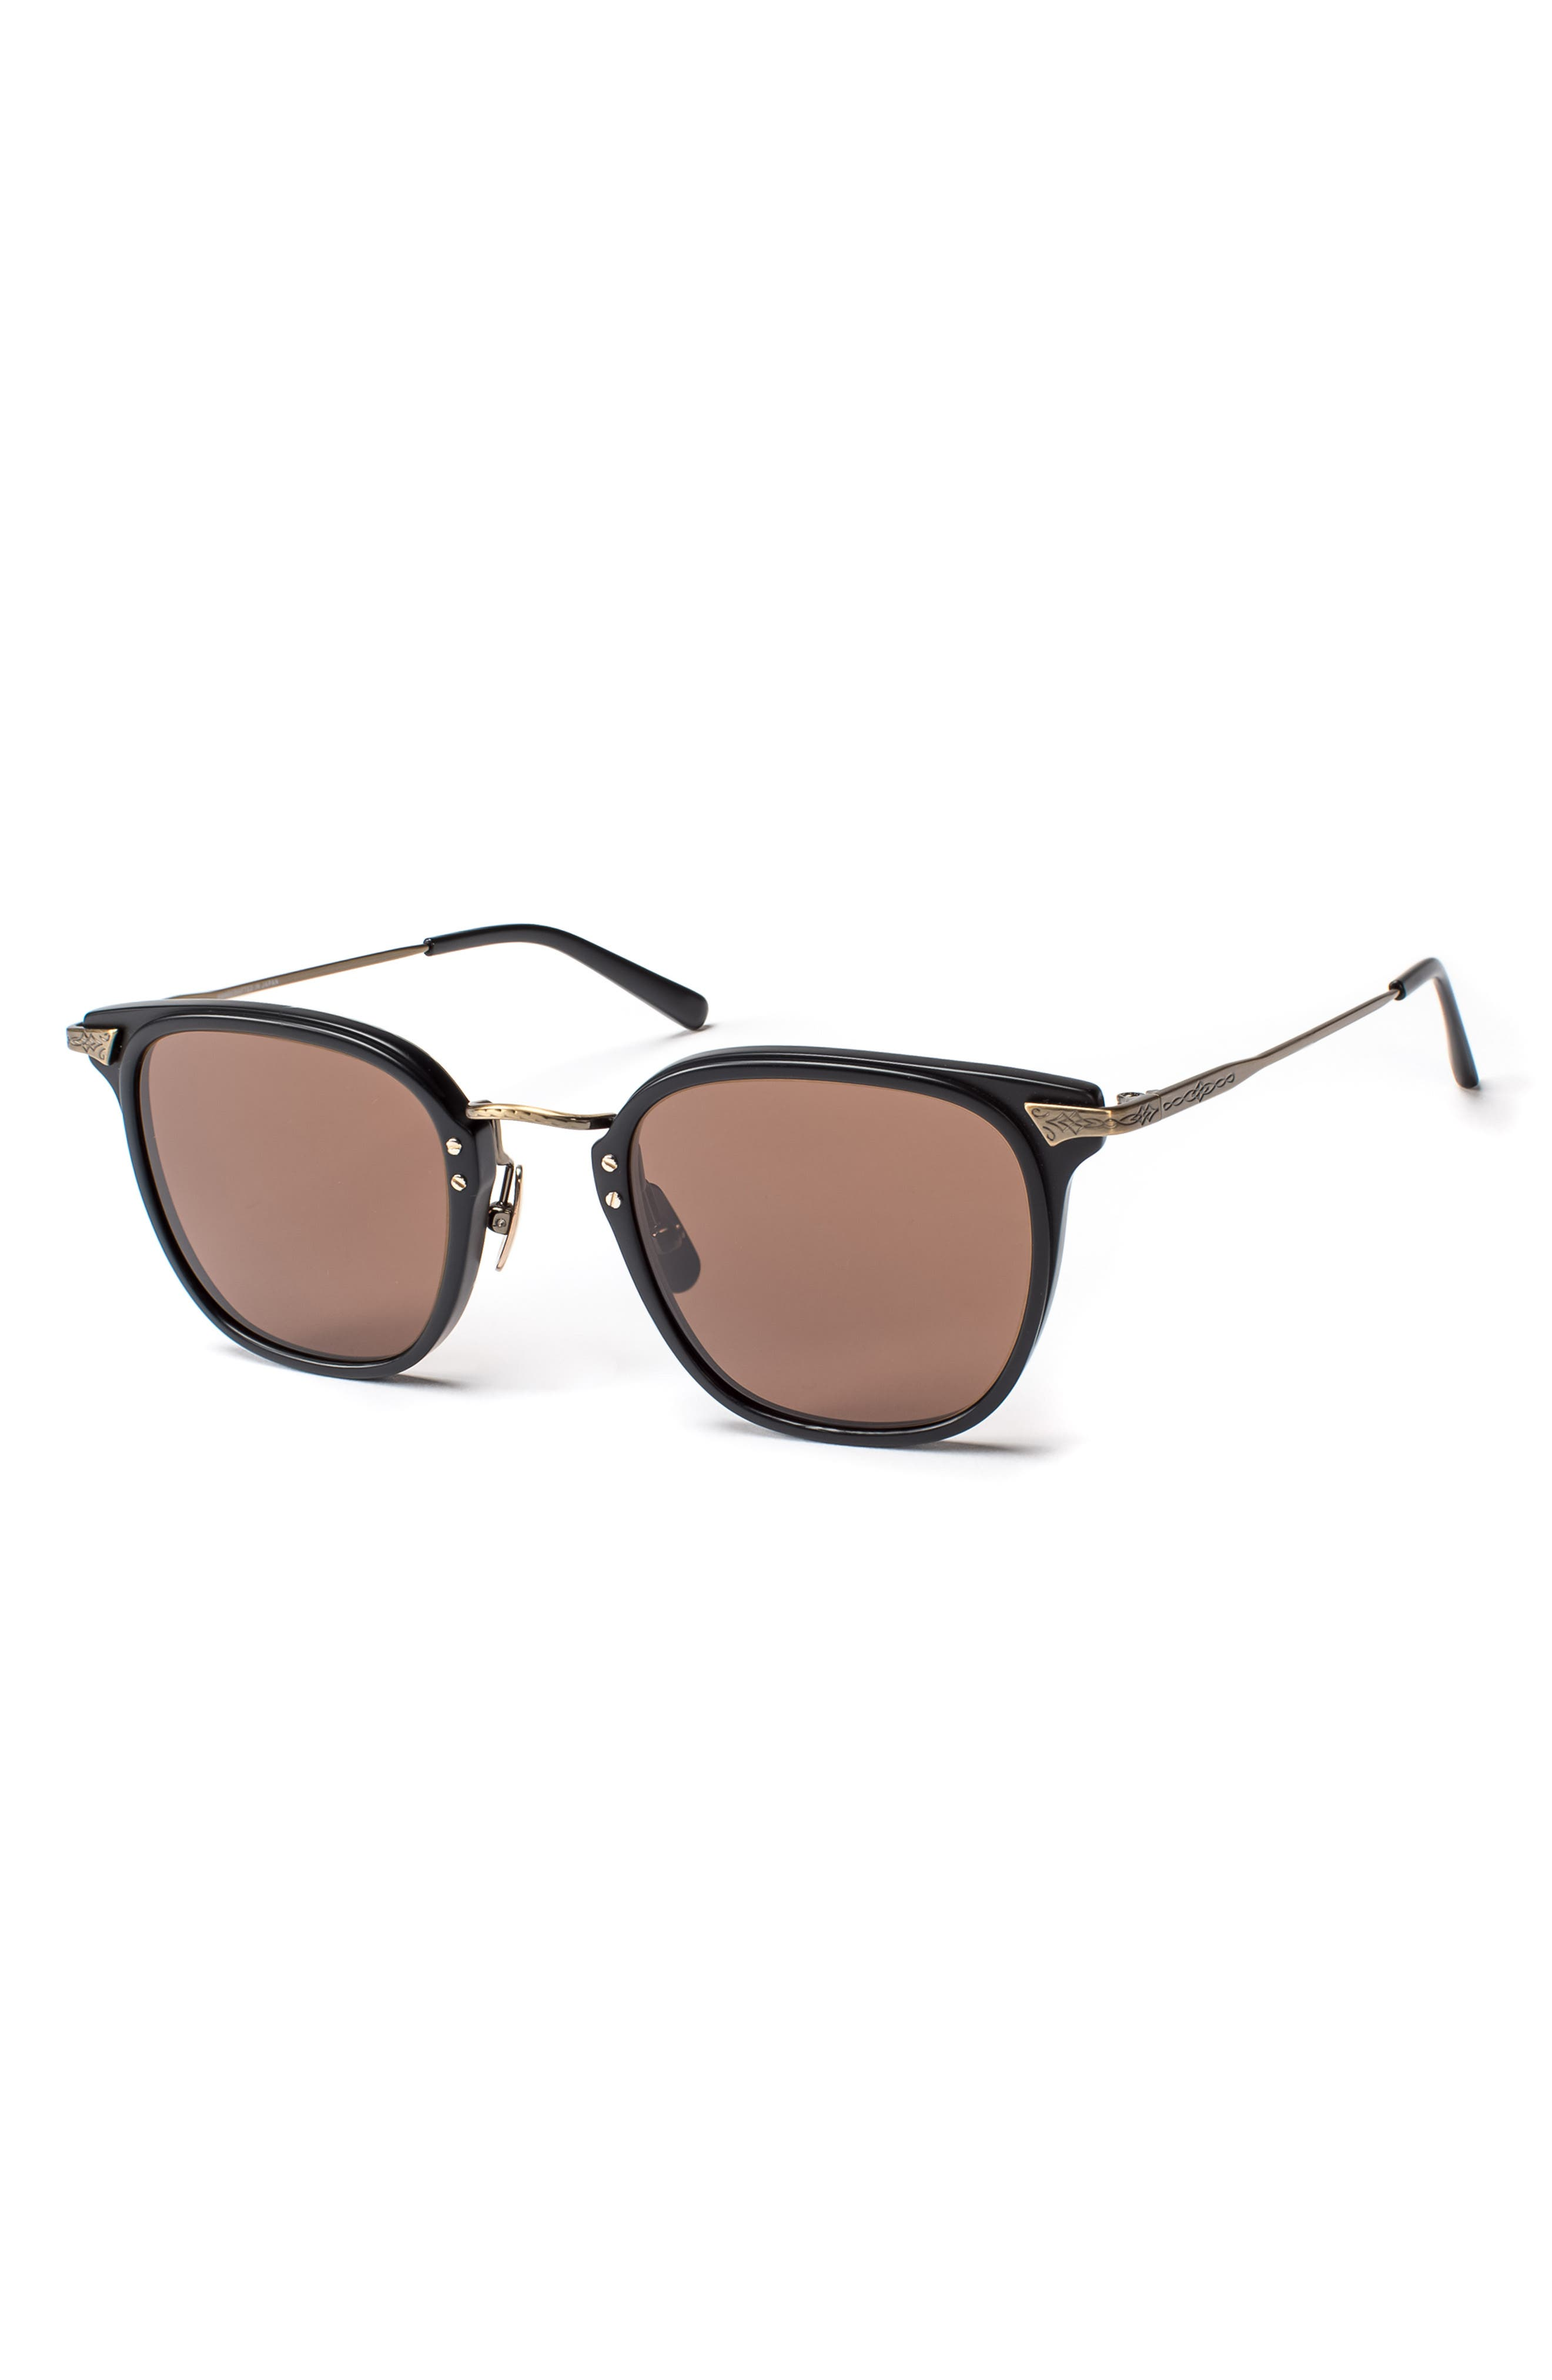 Hamilton 48mm Polarized Sunglasses,                             Main thumbnail 1, color,                             MATTE BLACK / ANTIQUE GOLD